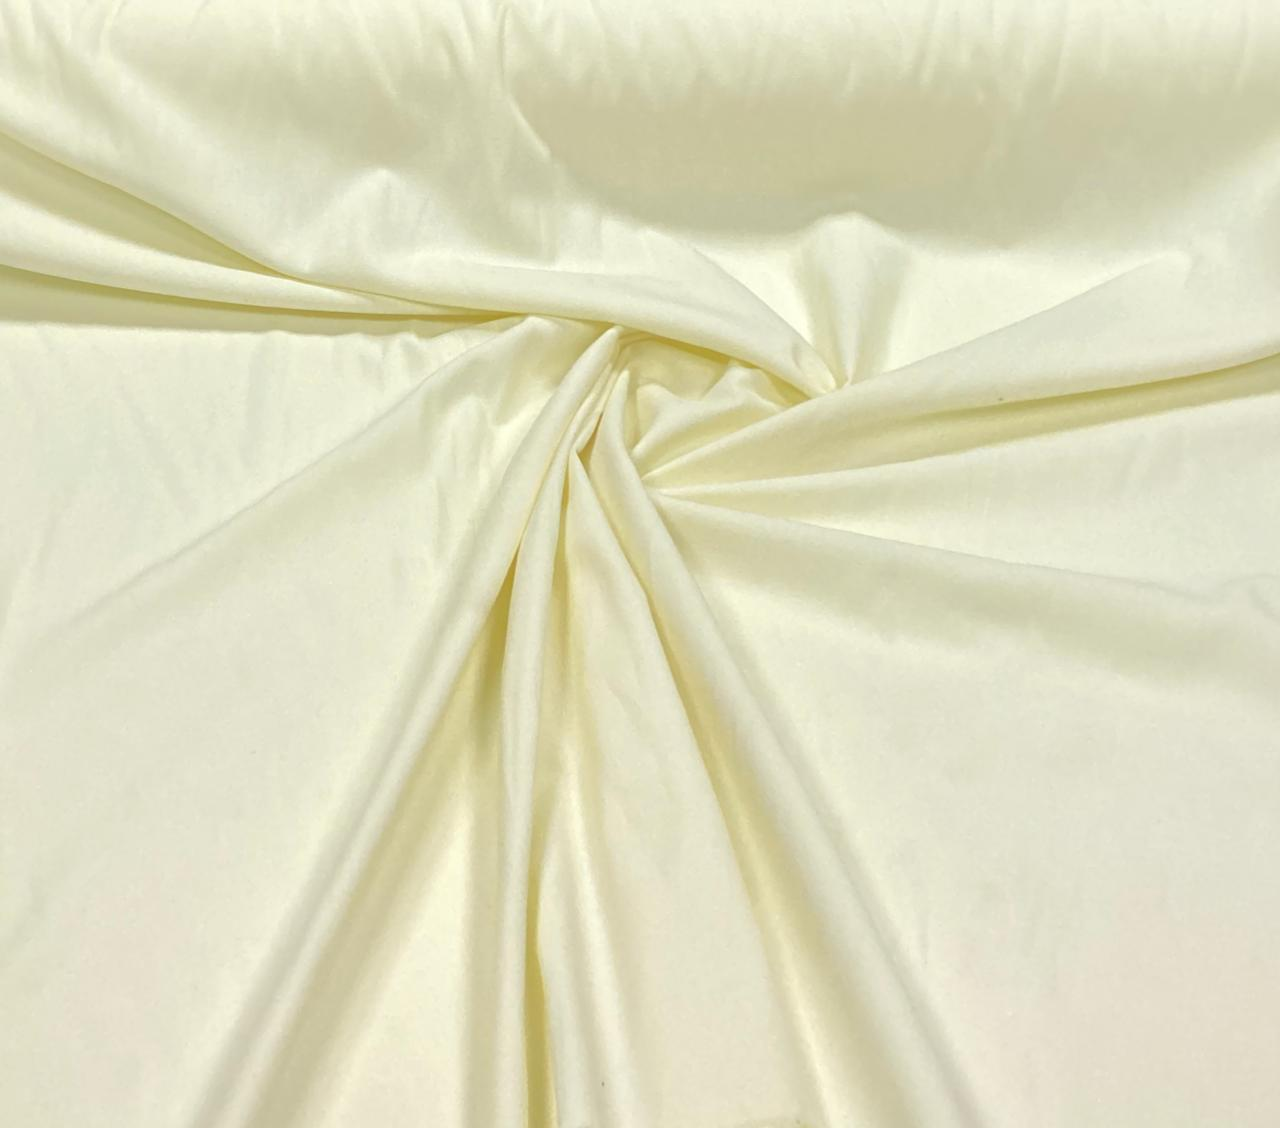 Sarja Cotton Amarelo Claro 100% Algodão - 1,6m Largura